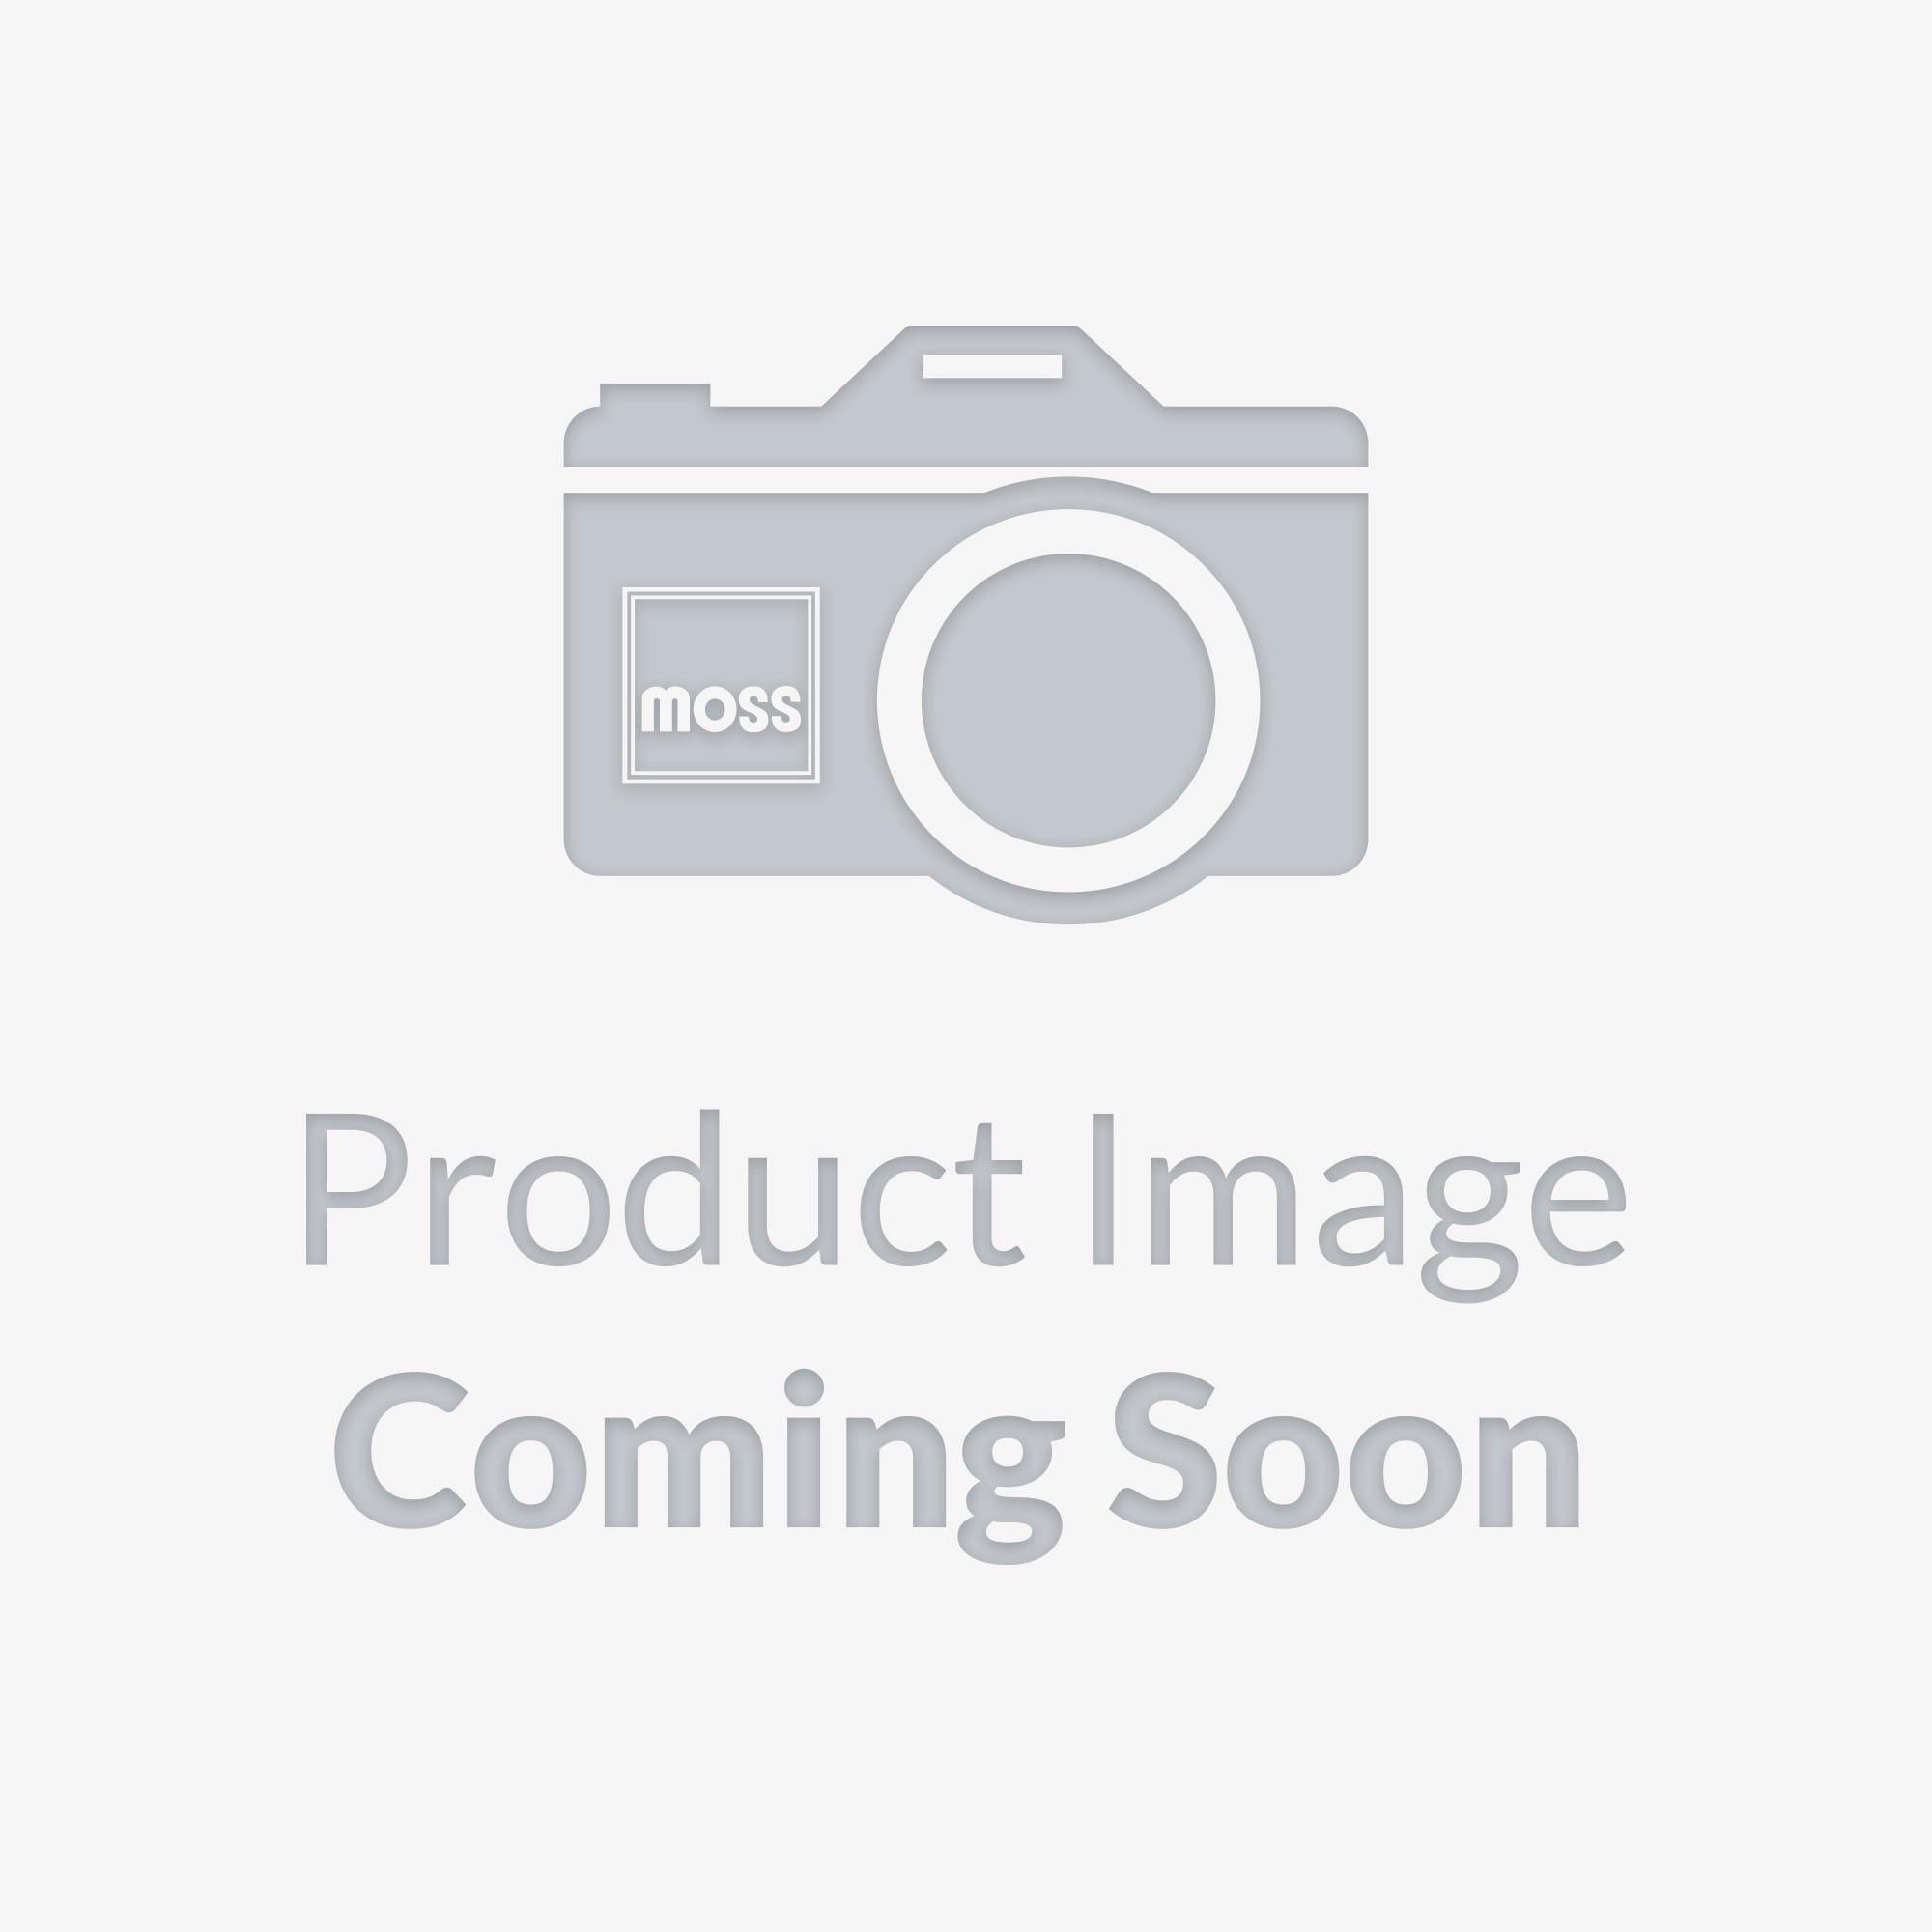 2006 Jaguar X Type Interior: Complete MGB Roadster Interior Packages, 1970-80